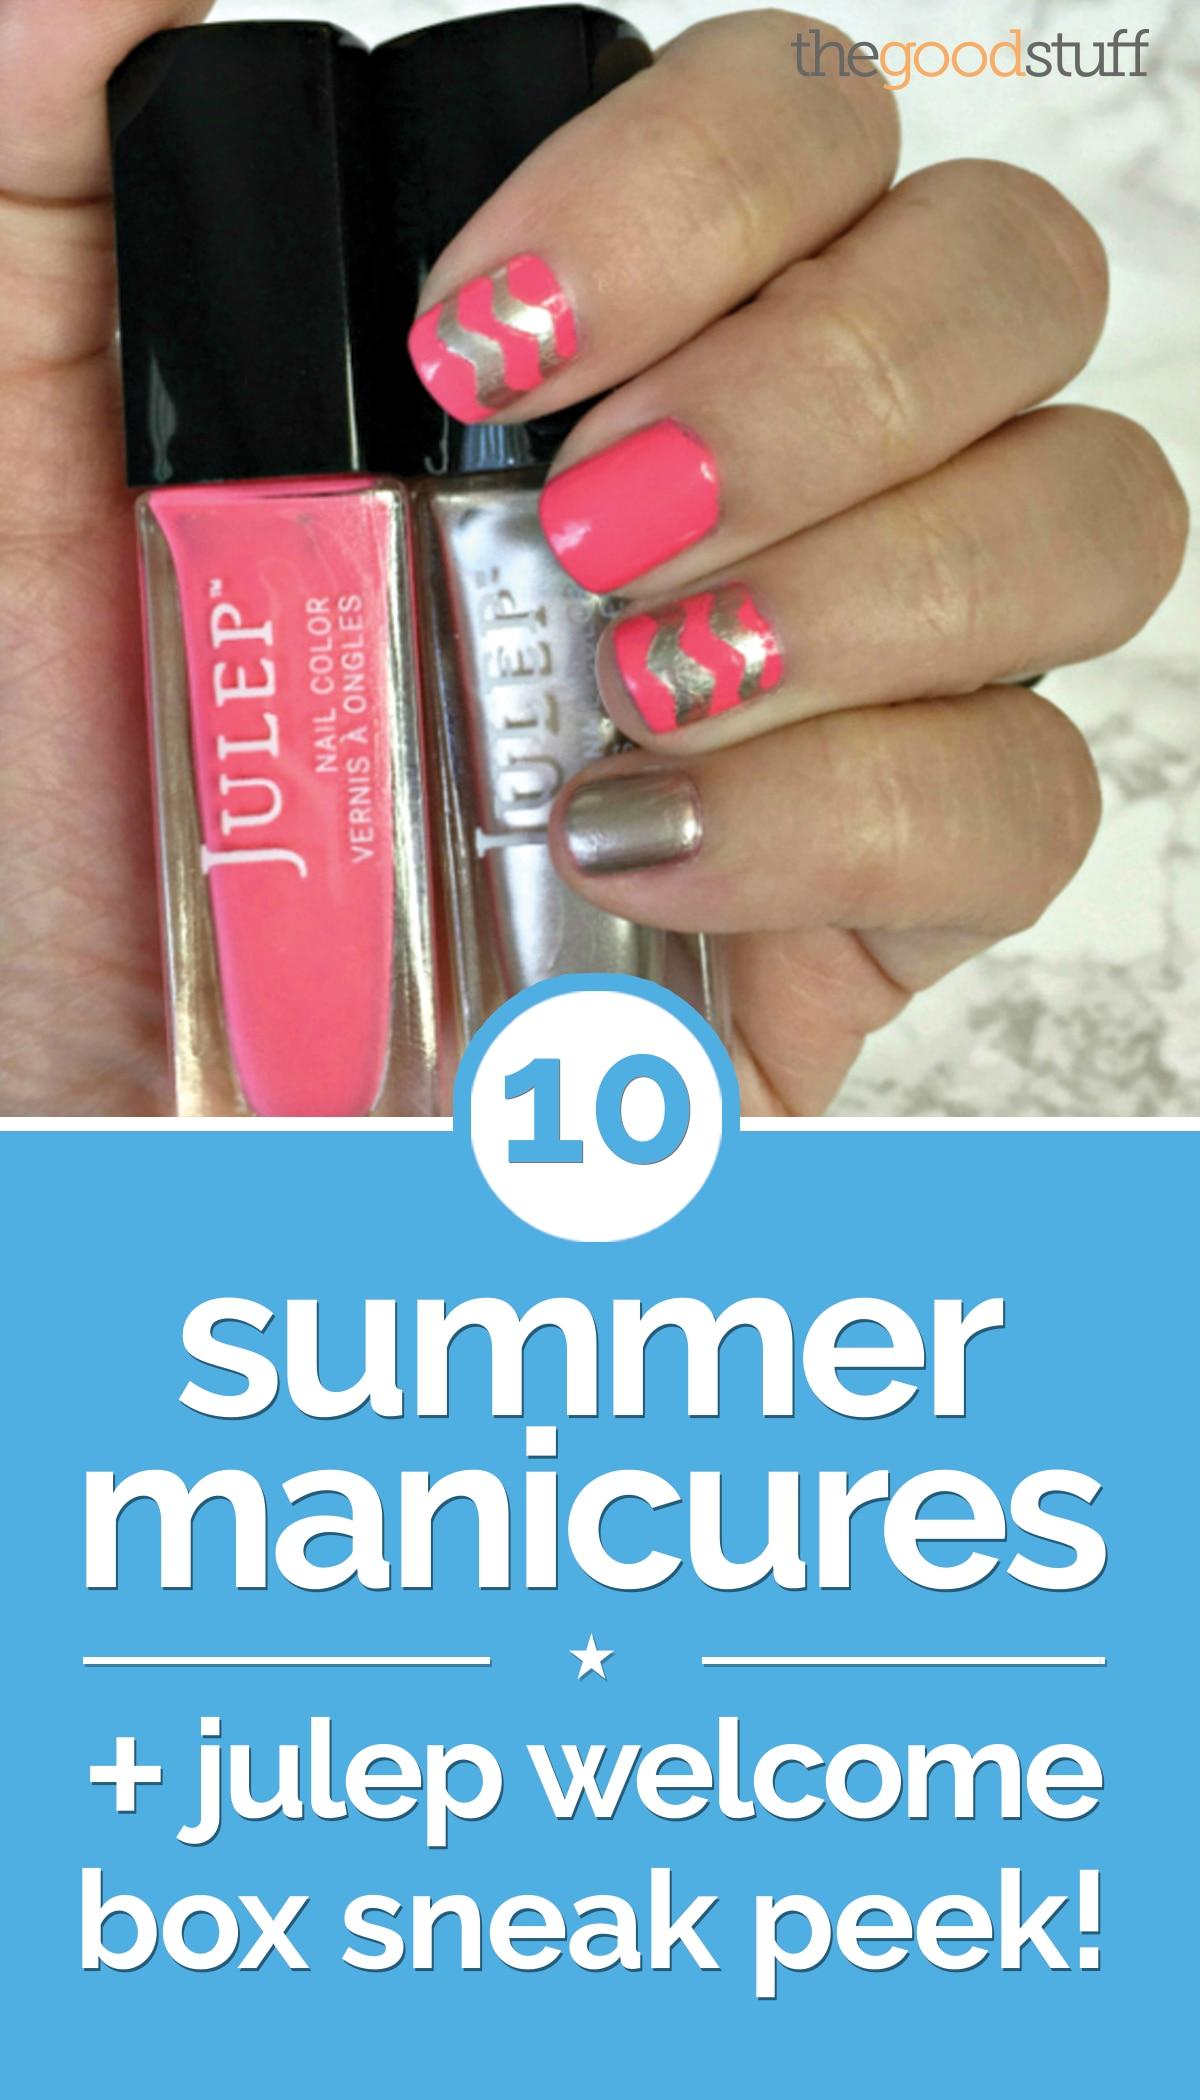 10 Summer Manicures + Julep Welcome Box Sneak Peek! | thegoodstuff